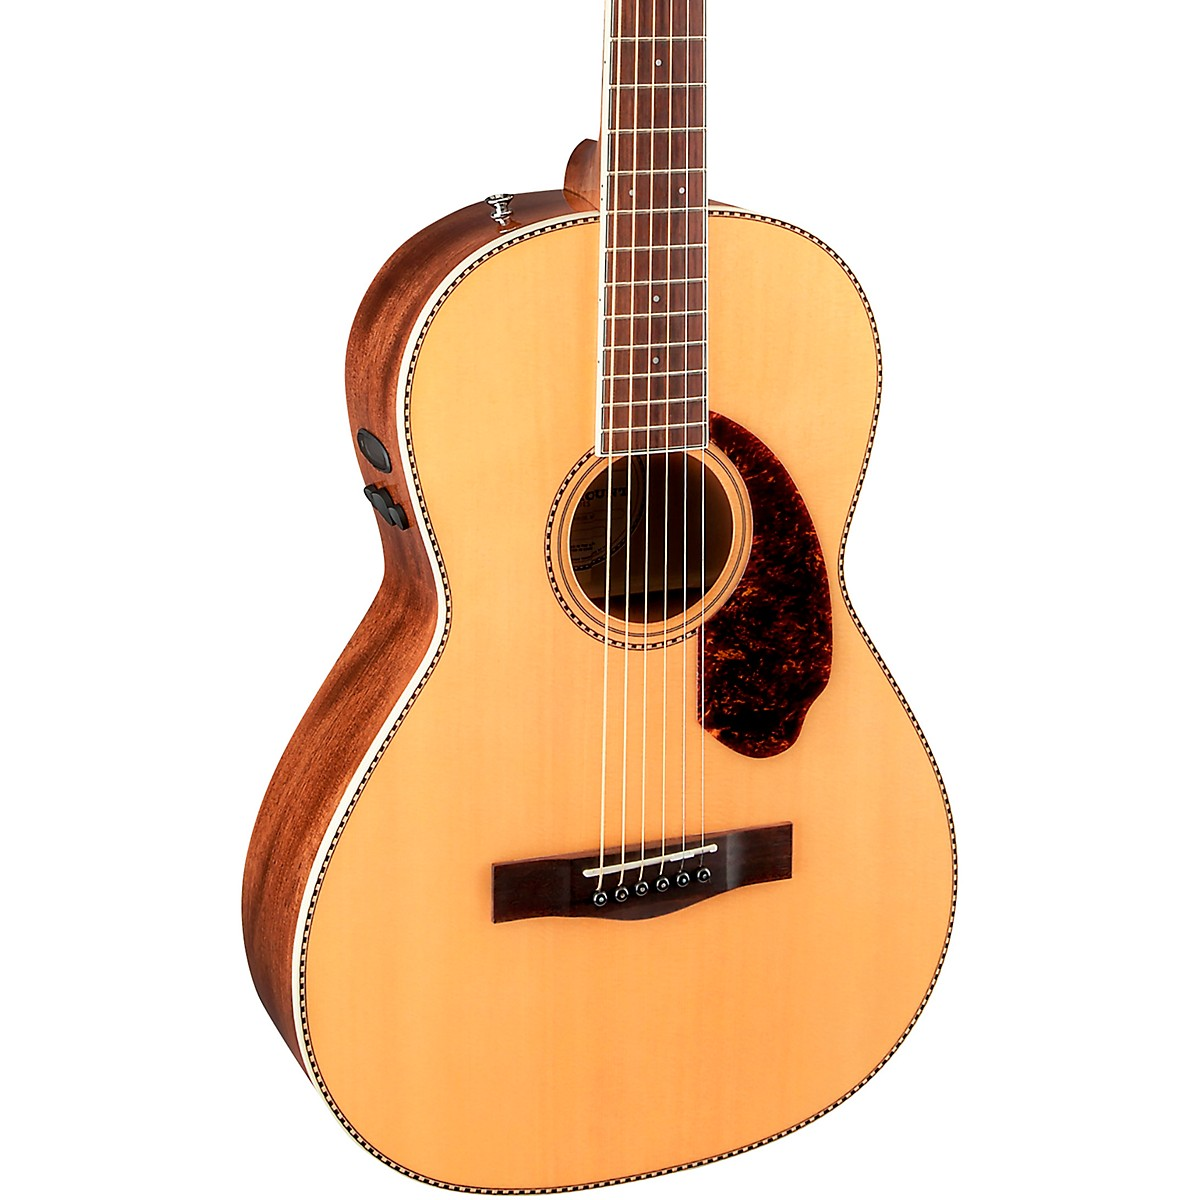 Fender PM-2 Parlor Ovangkol Fingerboard Acoustic-Electric Guitar